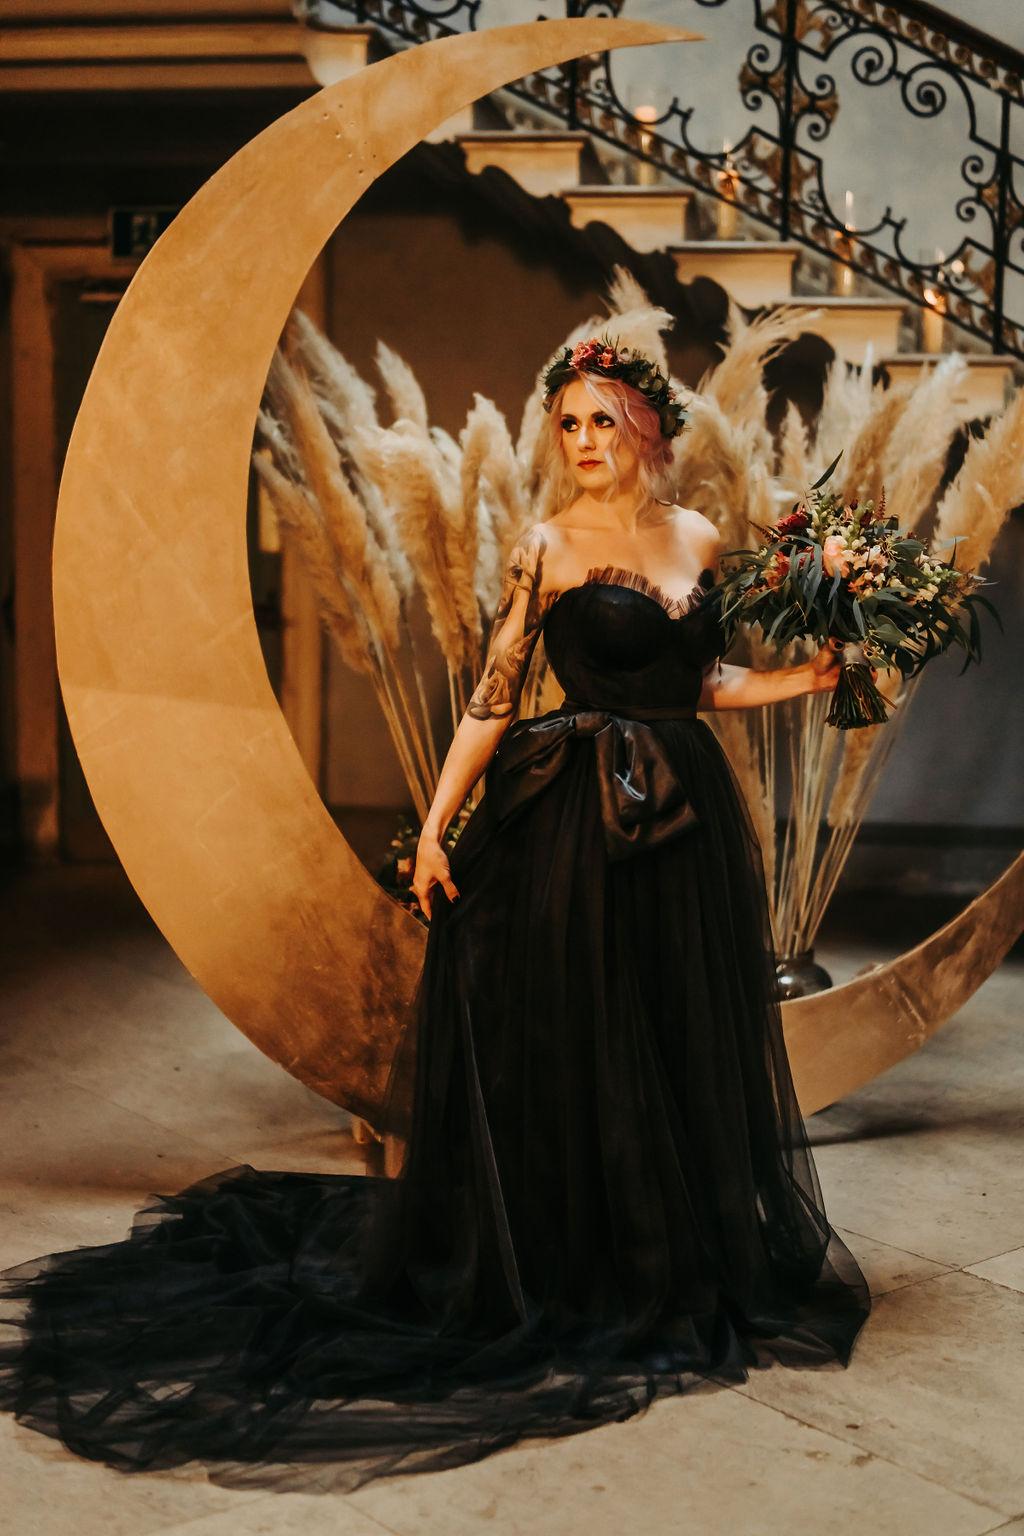 celestial gothic wedding - moon wedding prop - black wedding dress - alternative wedding - edgy wedding